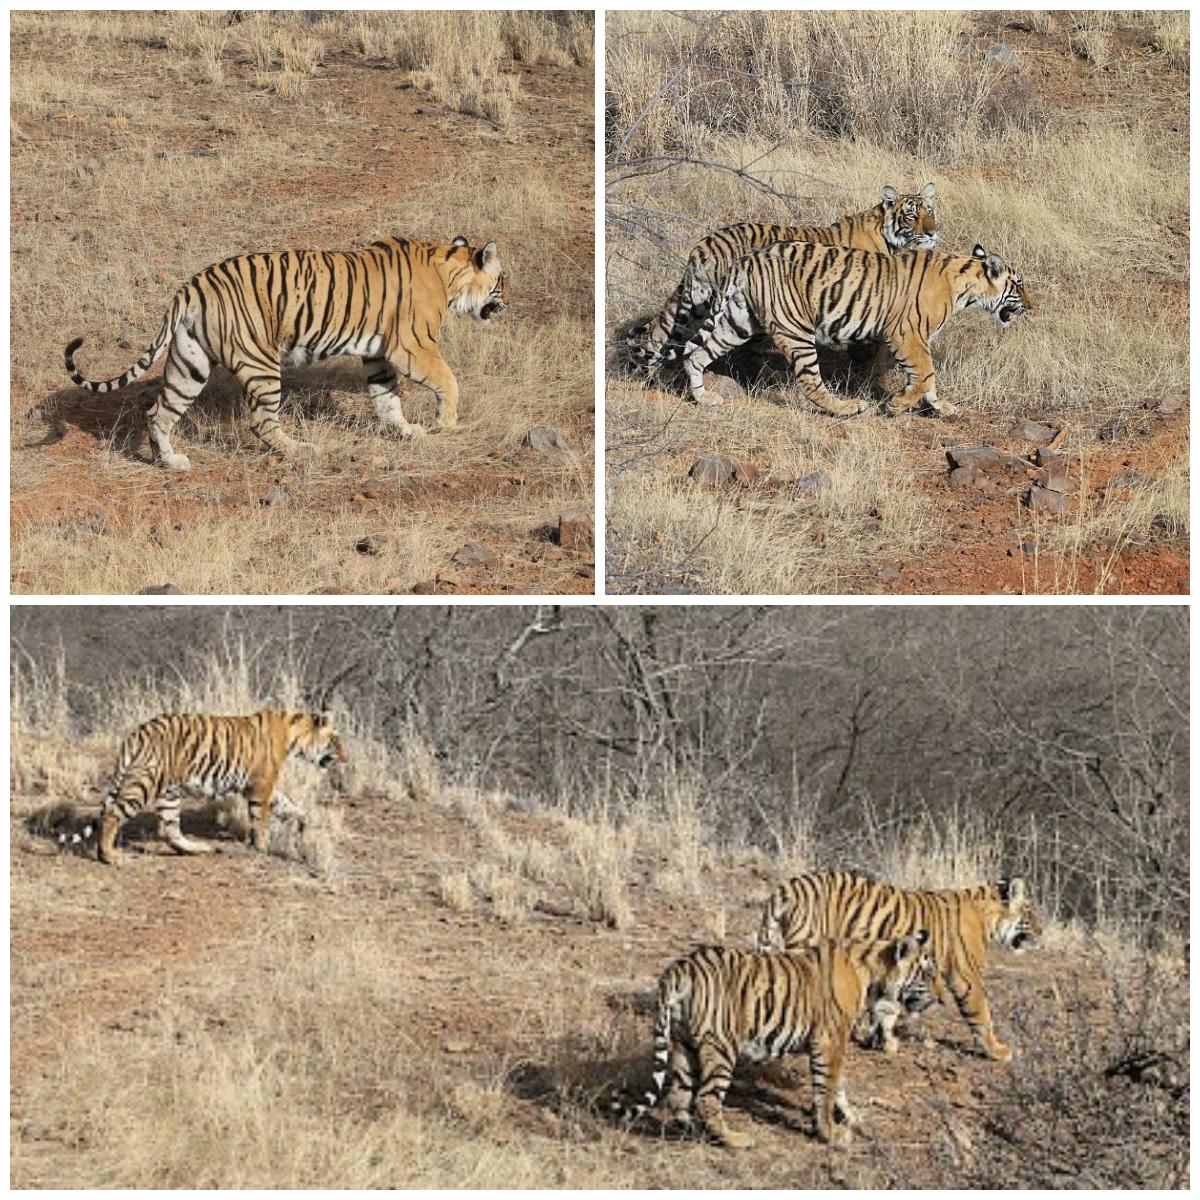 Tiger Safari Ranthambore National Park, India